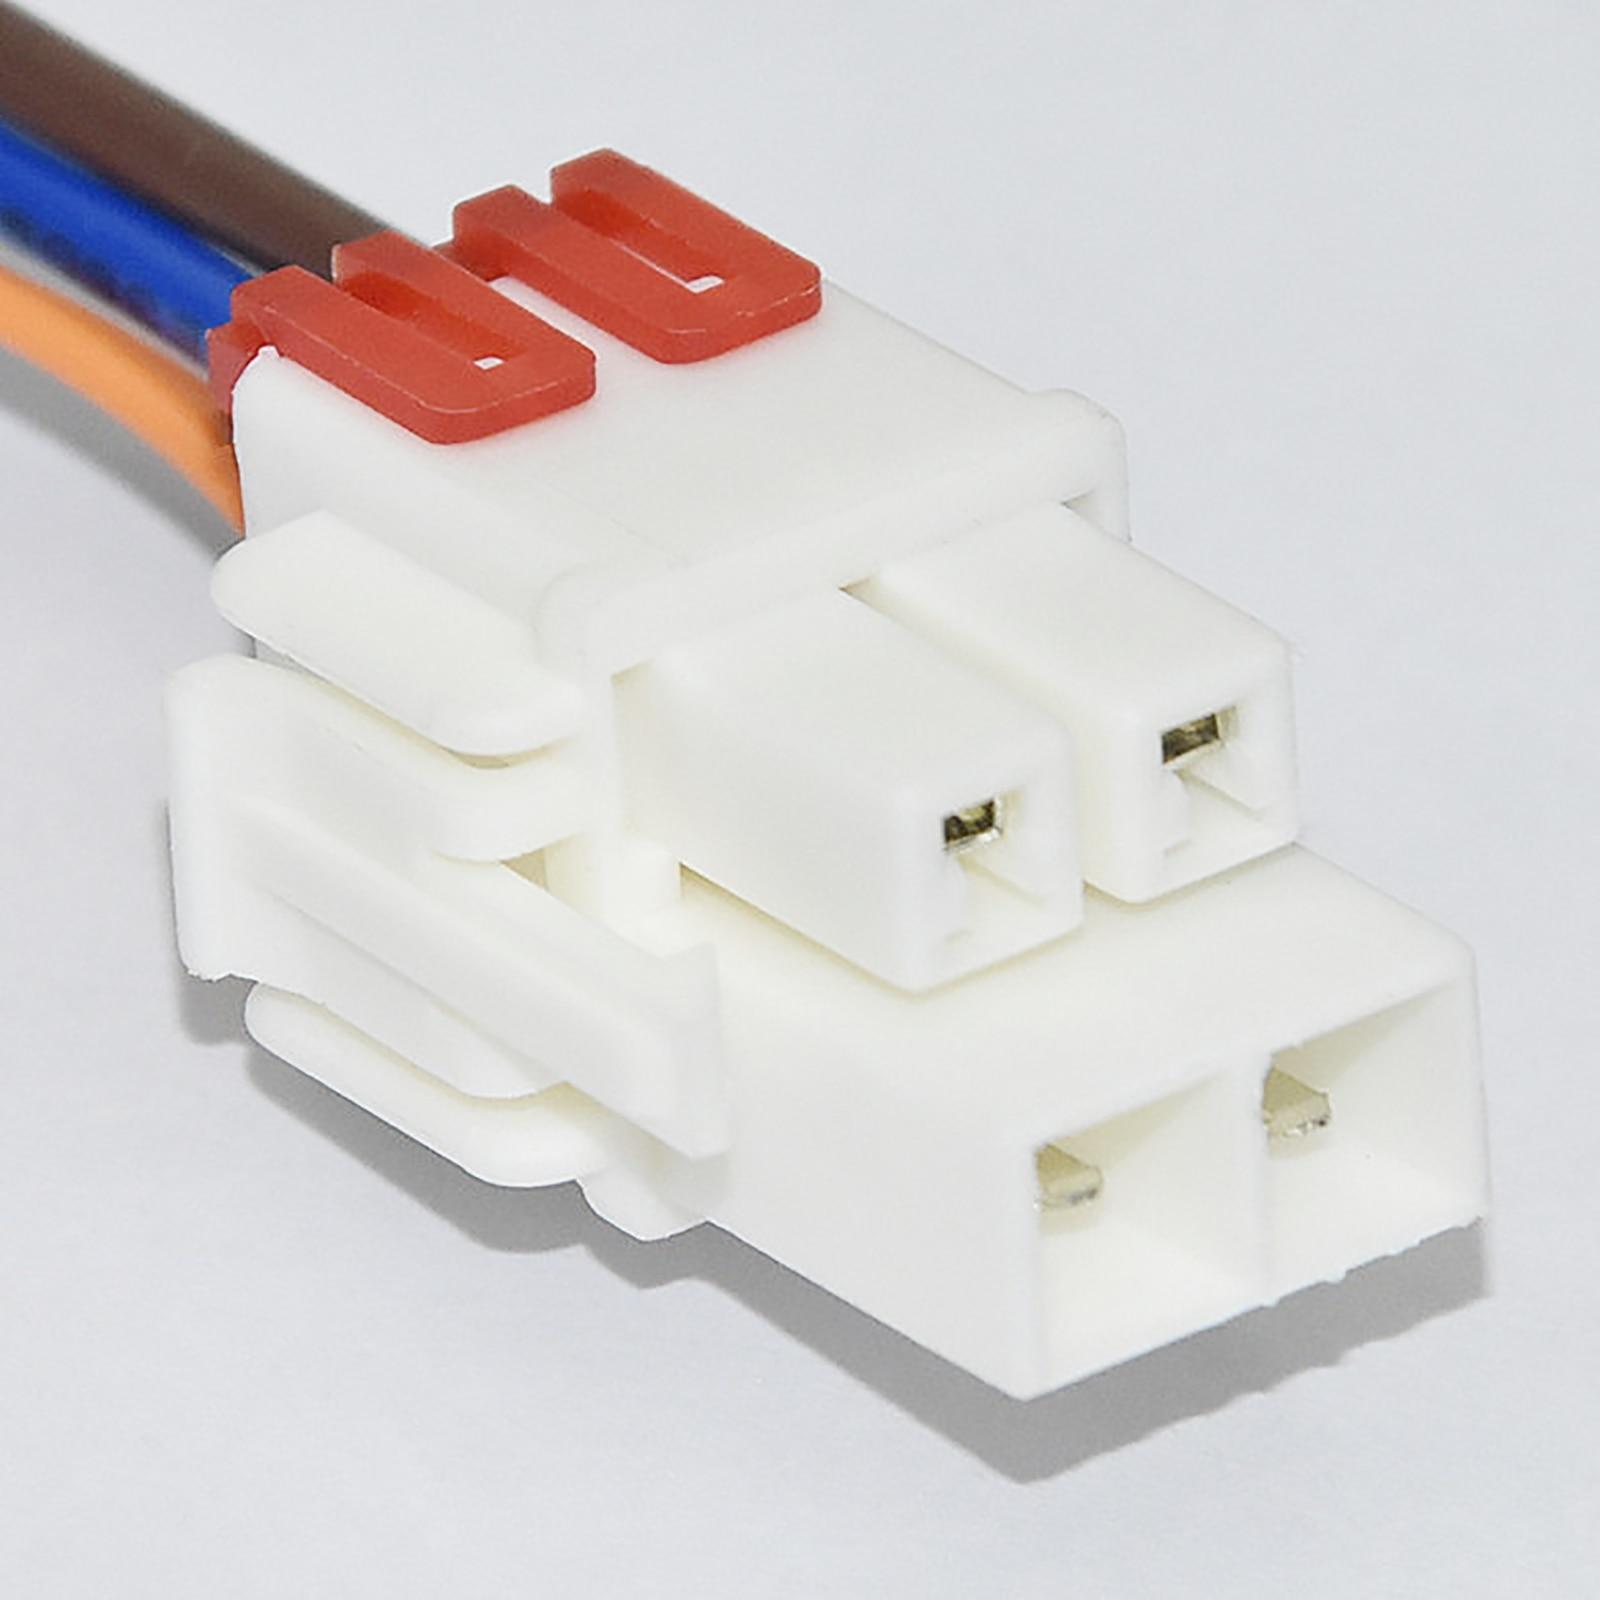 PS3529340 Refrigerator Defrost Sensor for LG AP4438477 6615JB2005H